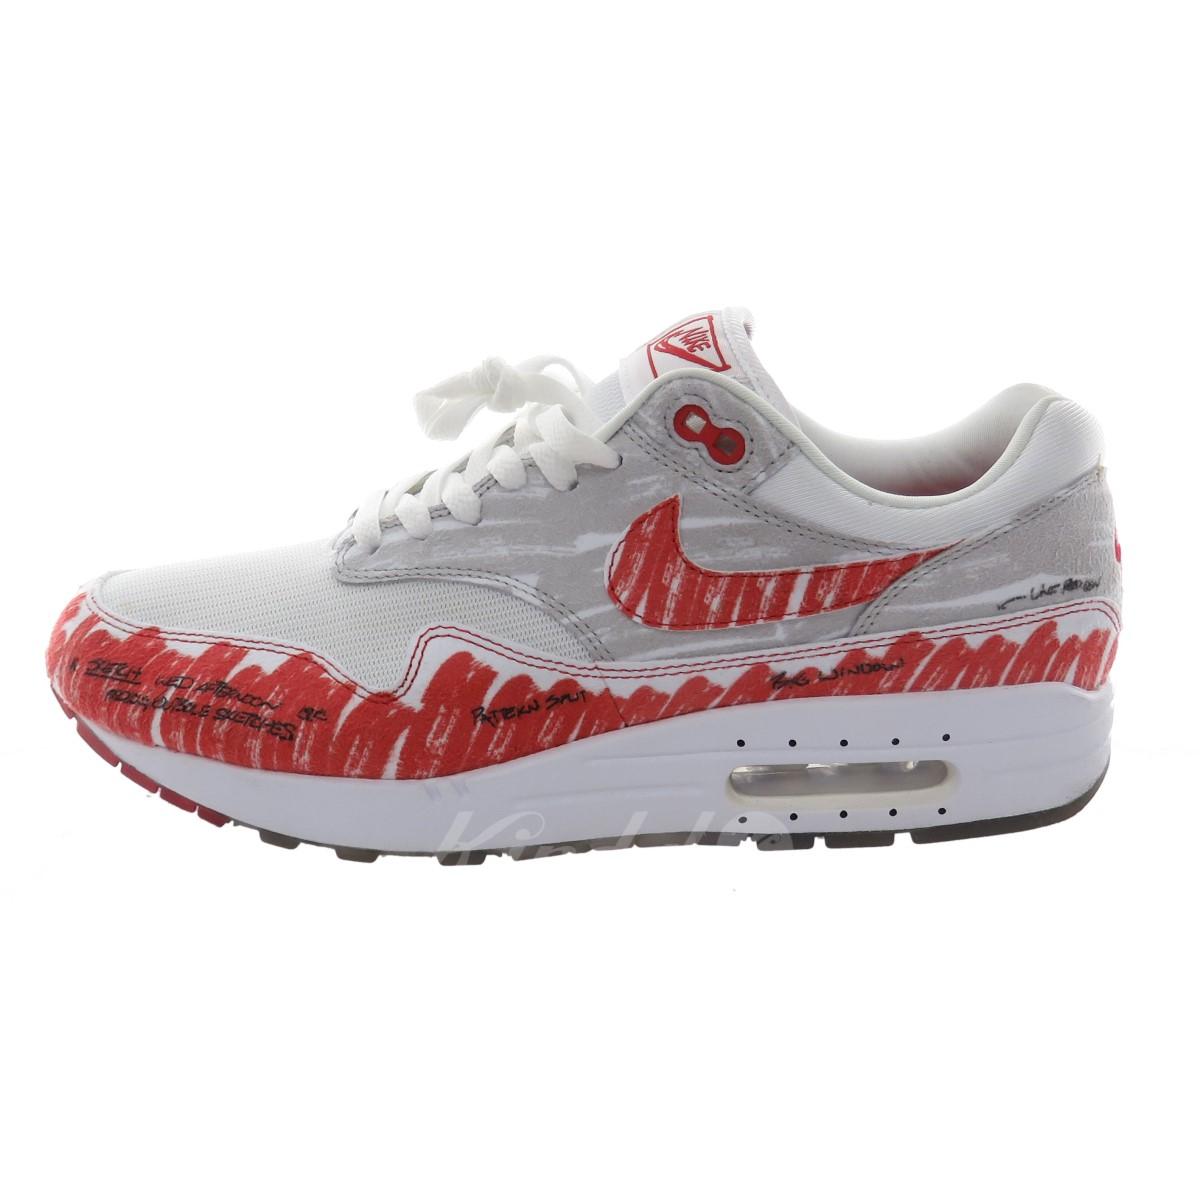 NIKE AIR MAX 1 SKETCH TO SHELF sneakers CJ4286 101 white X red size: 28. 5cm (Nike)